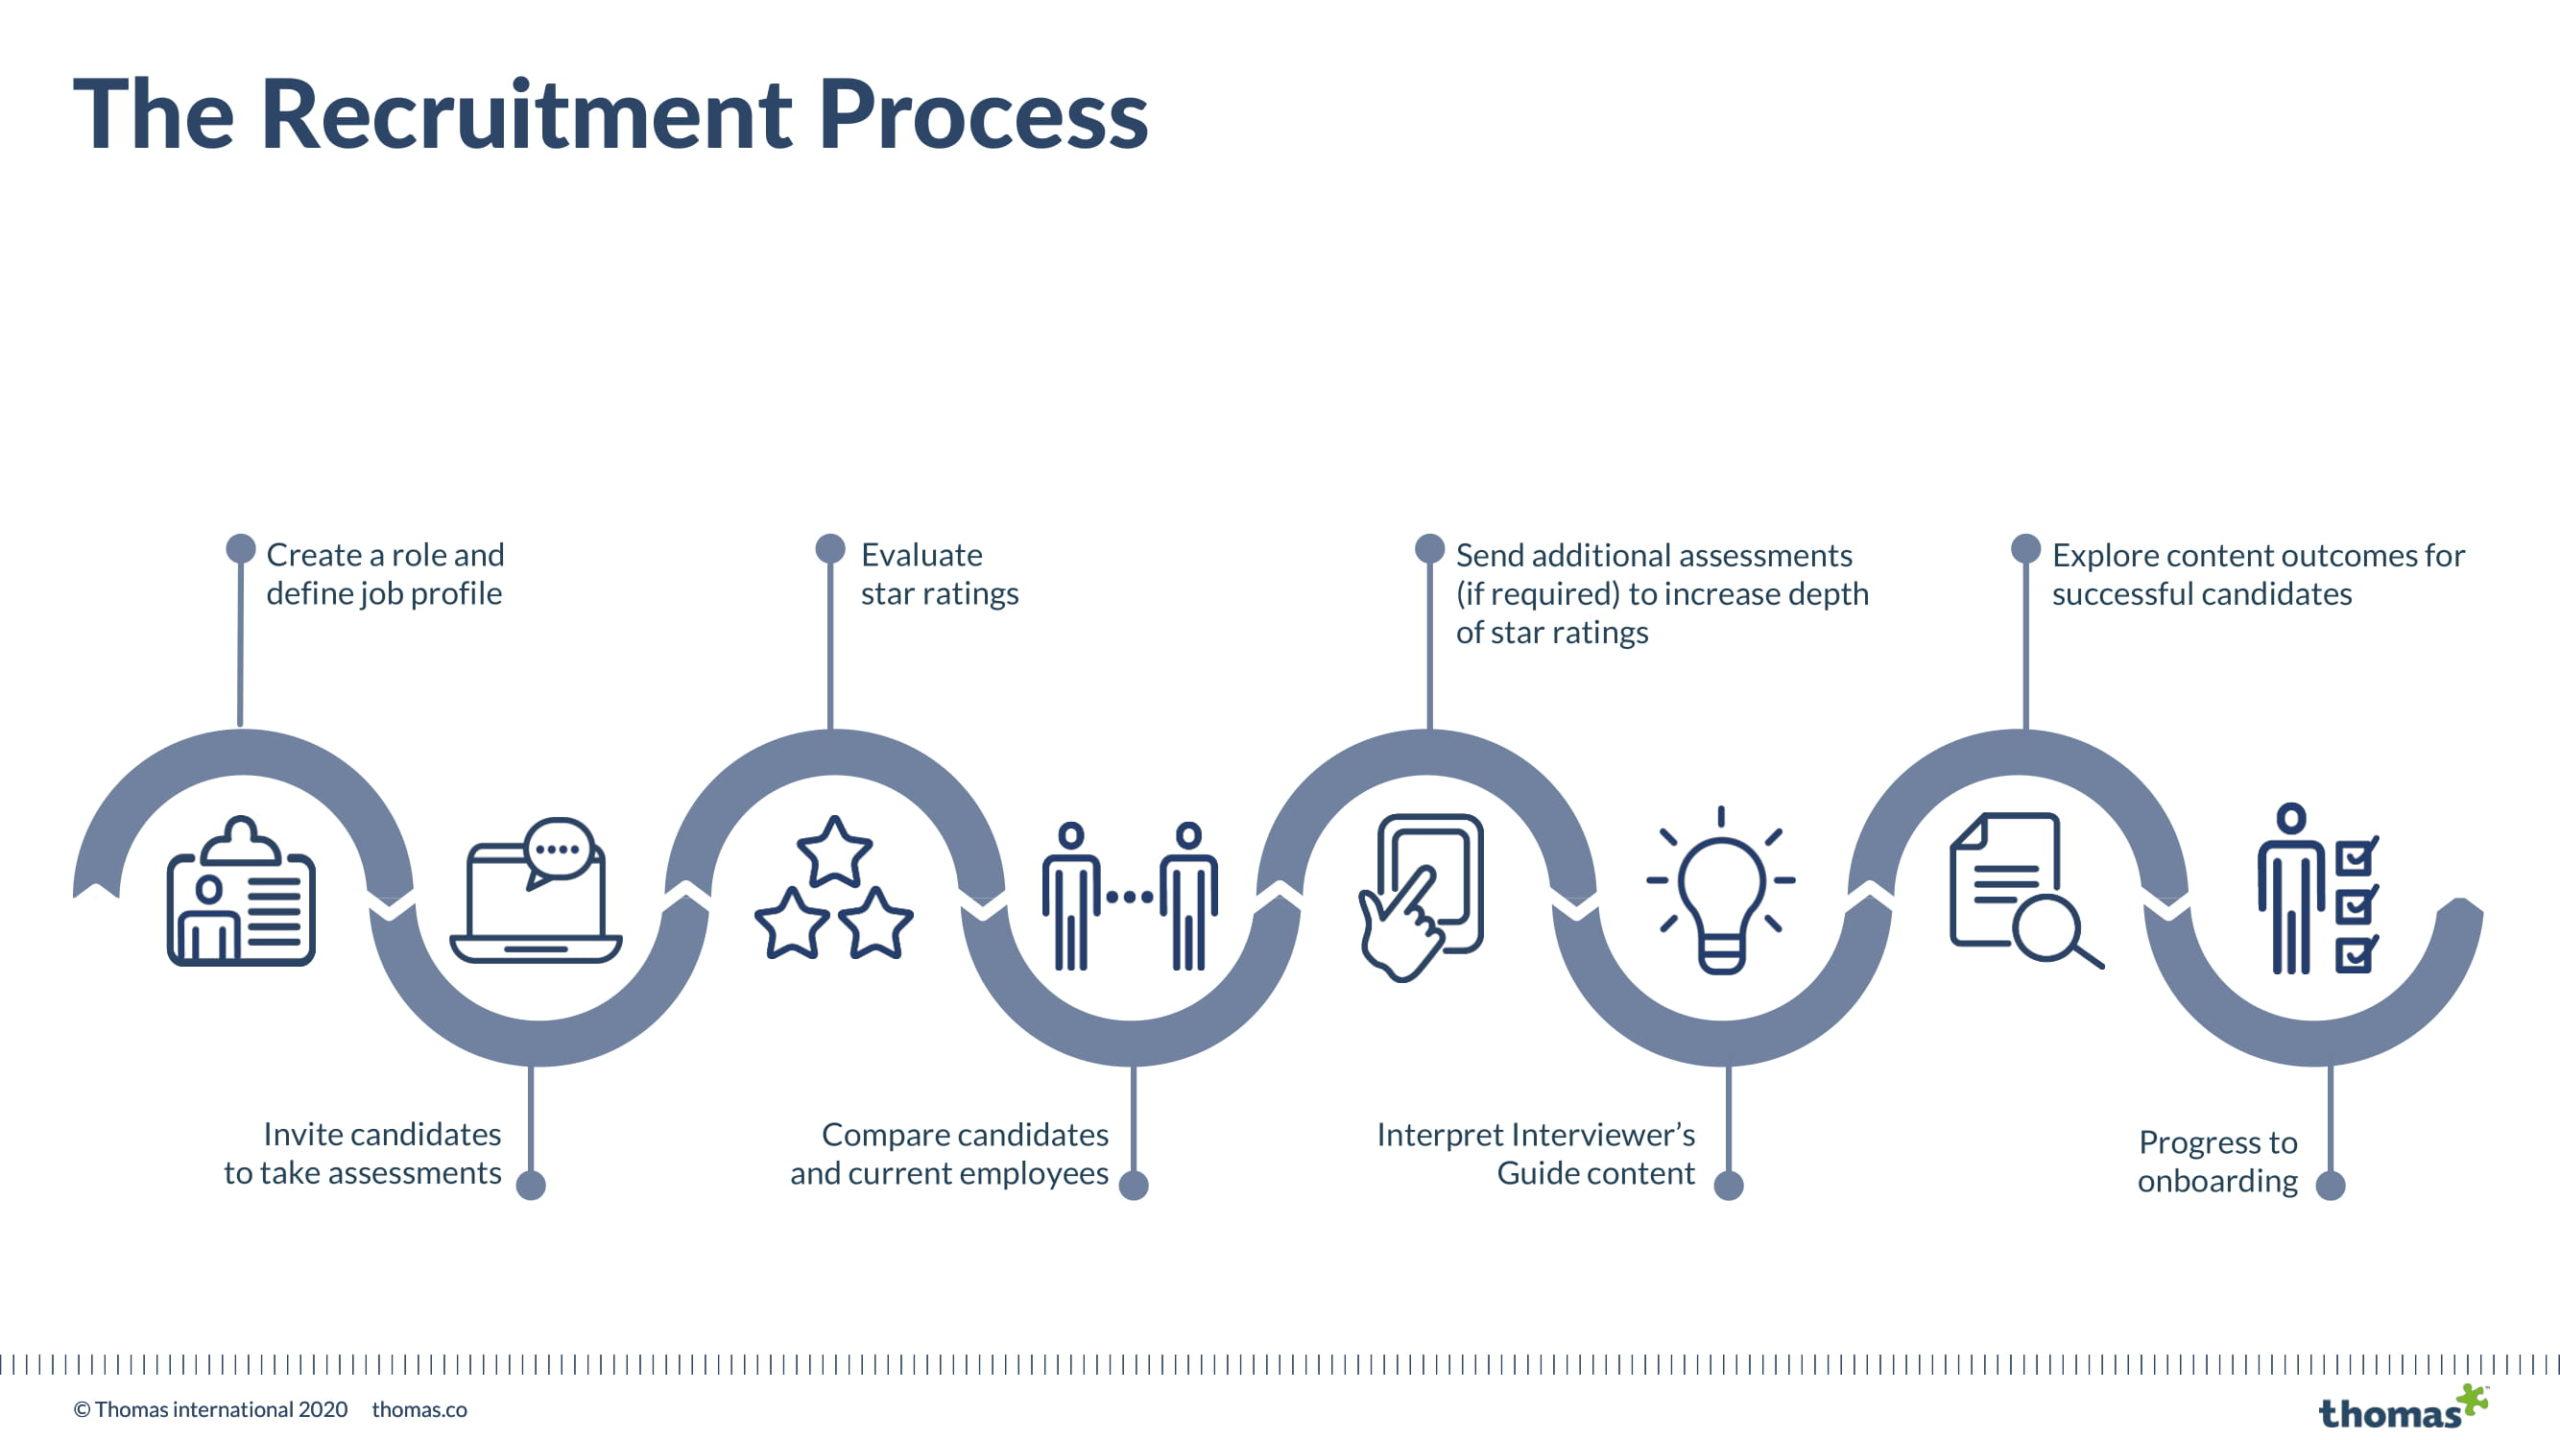 Thomas Sales Presentation September 2020 Multi Assessment